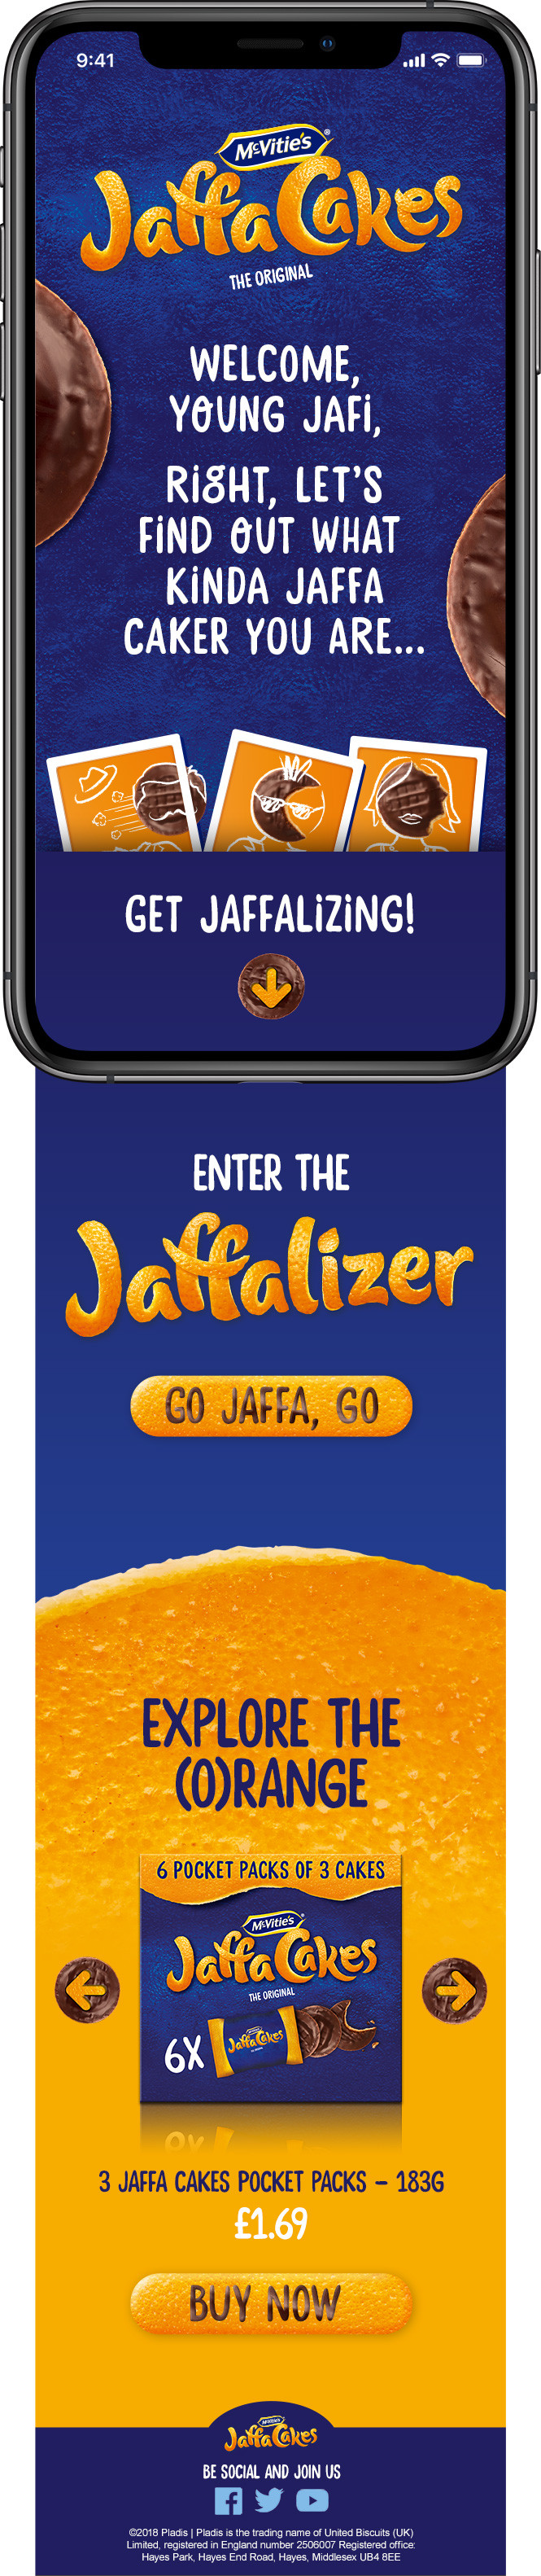 The 'Jaffalizer' landing page